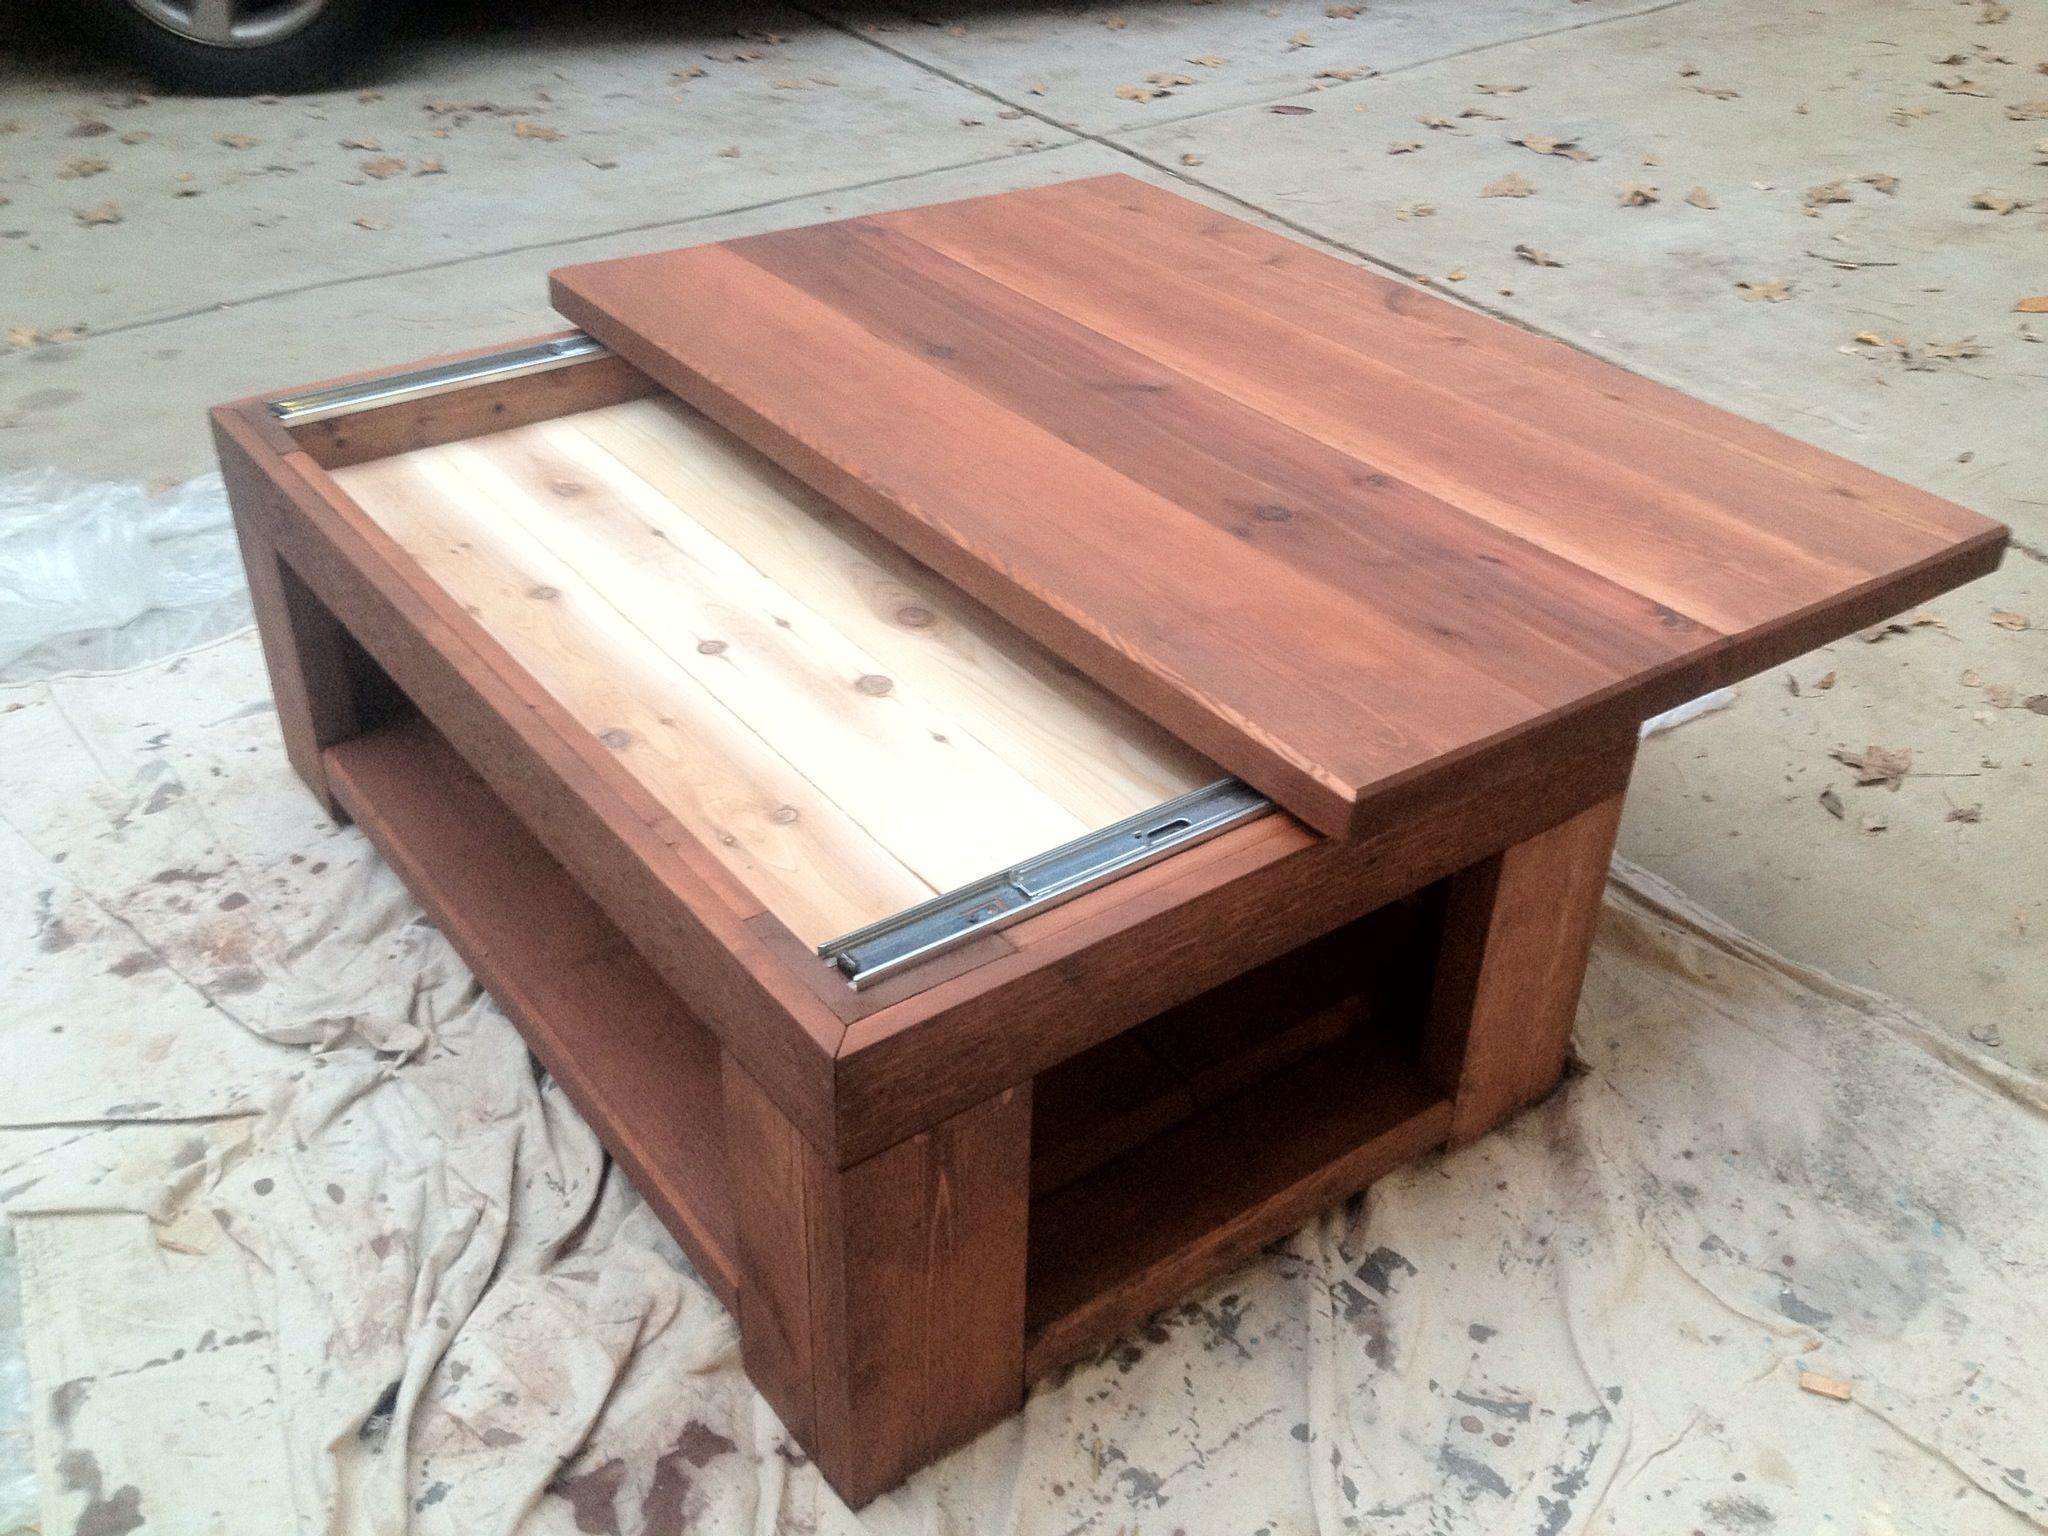 10 Easy To Build Diy Unique Coffee Tables Unique Diy Diyuniquecoffeetables I Coffee Table Plans Coffee Table Furniture Design Diy Farmhouse Coffee Table [ 1536 x 2048 Pixel ]